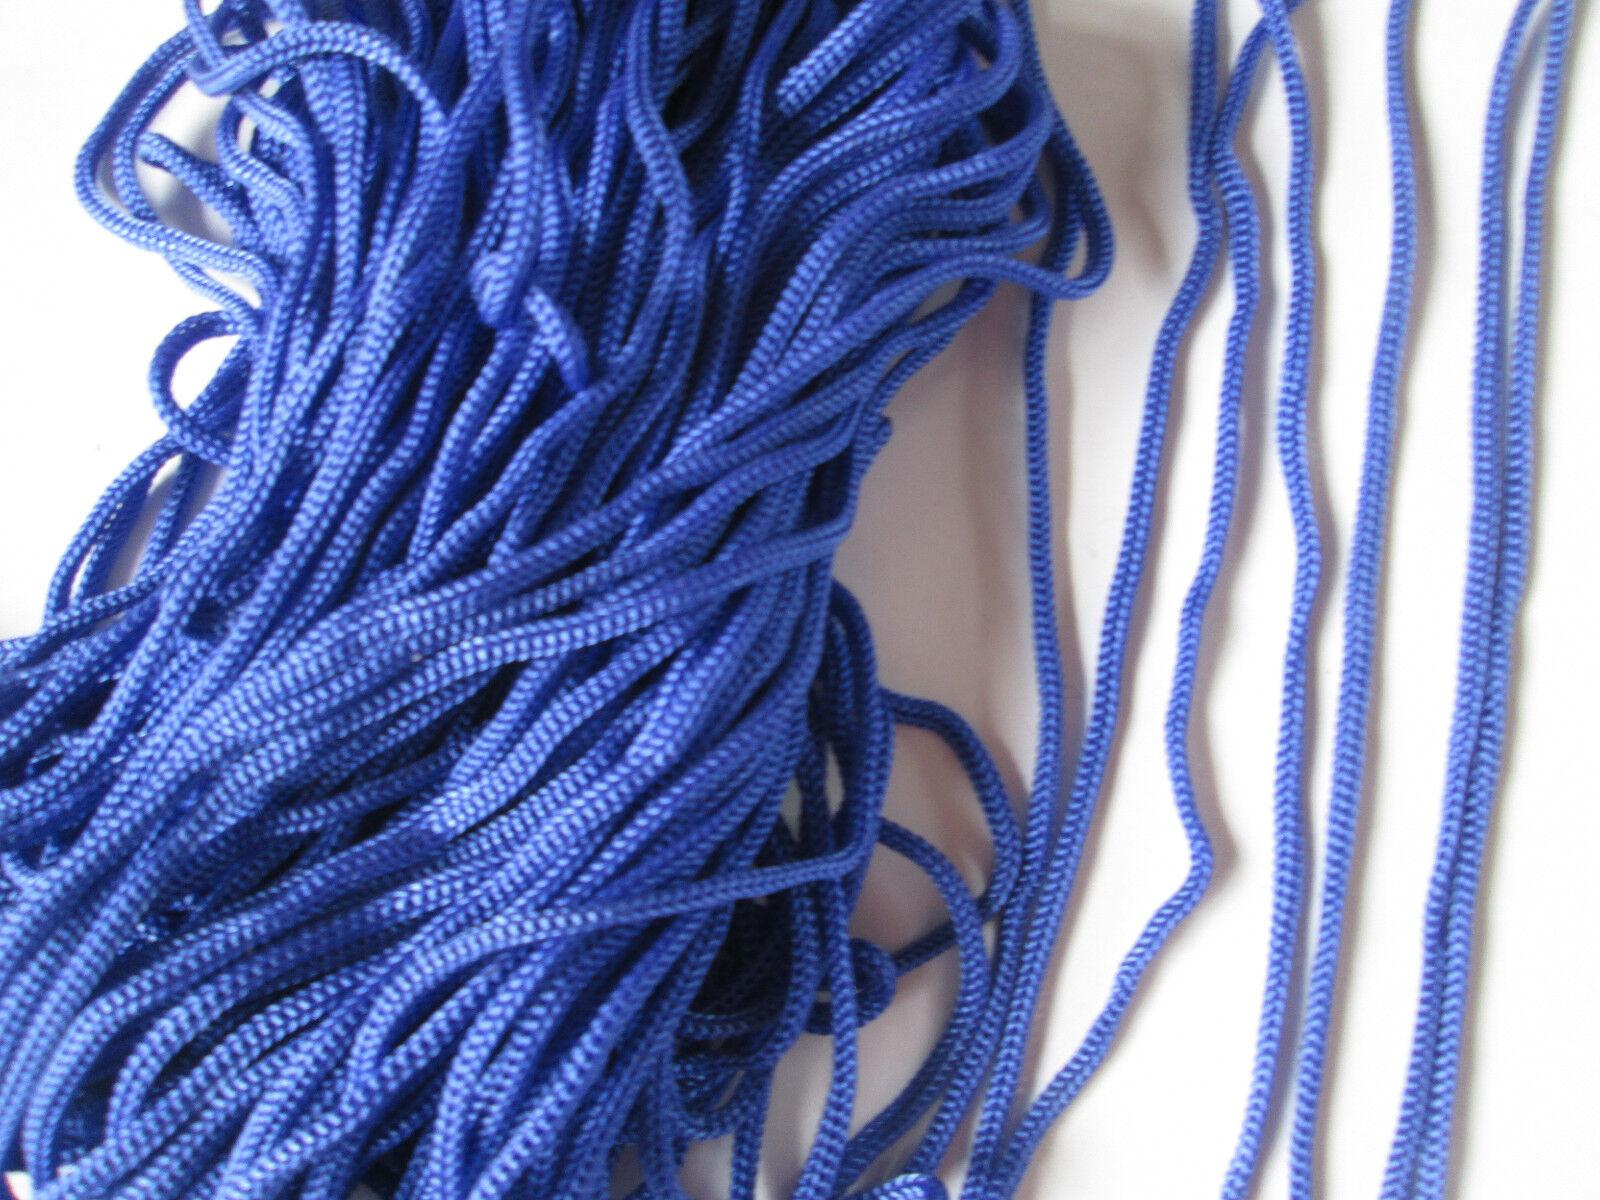 10 METER kordel Satin Royal Blau 5mm elegante Borte Spitze KR 024